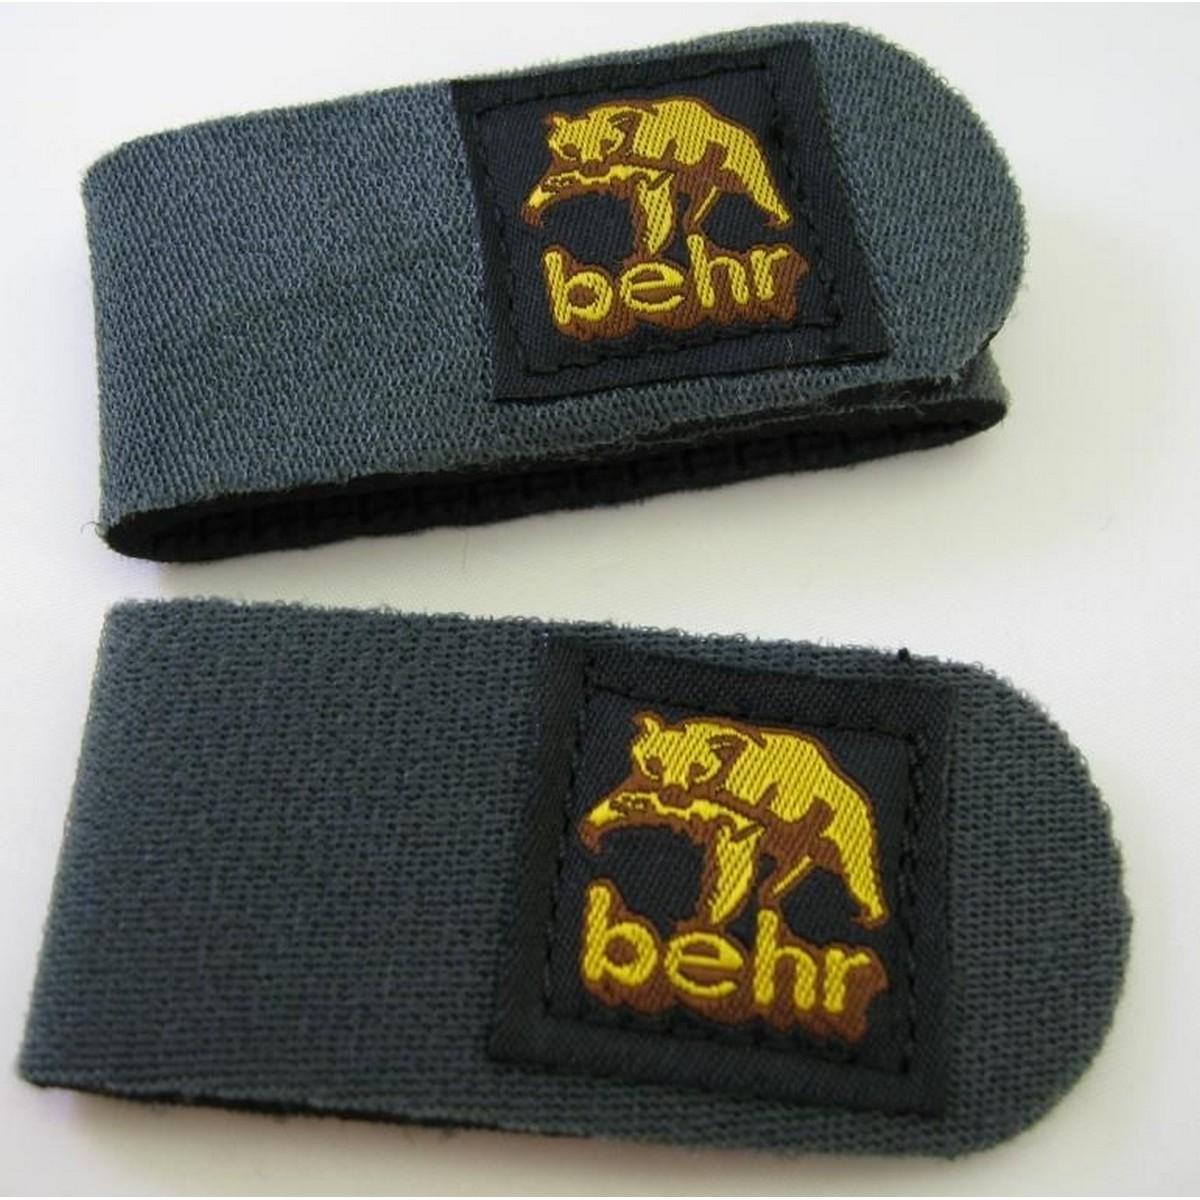 Неопренови велкро ленти за пръчки Behr 14 + 21 см